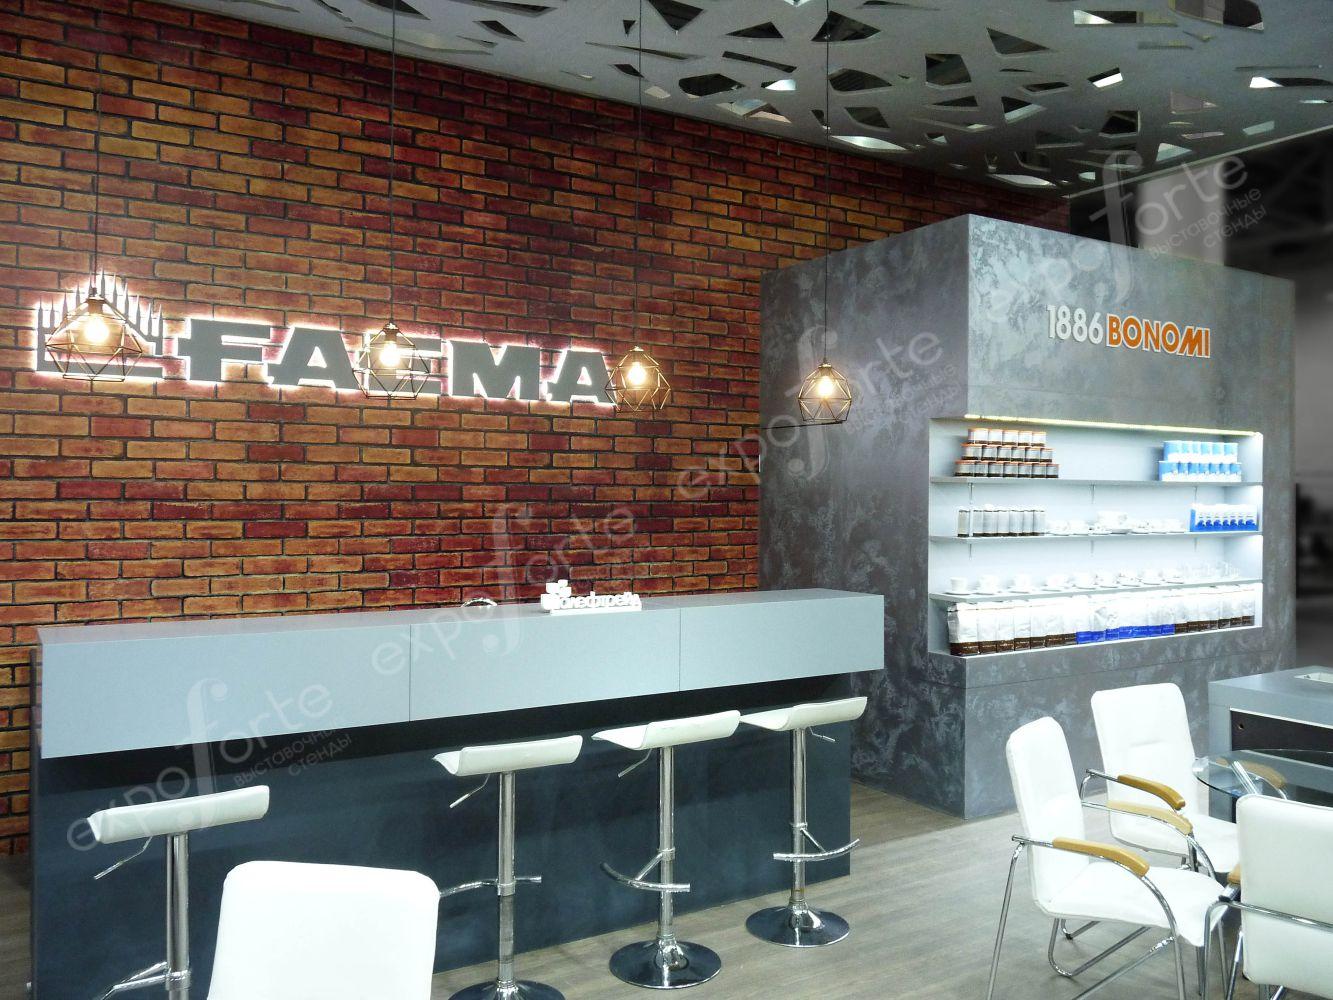 Фото: FAEMA, выставка PIR – картинка 2